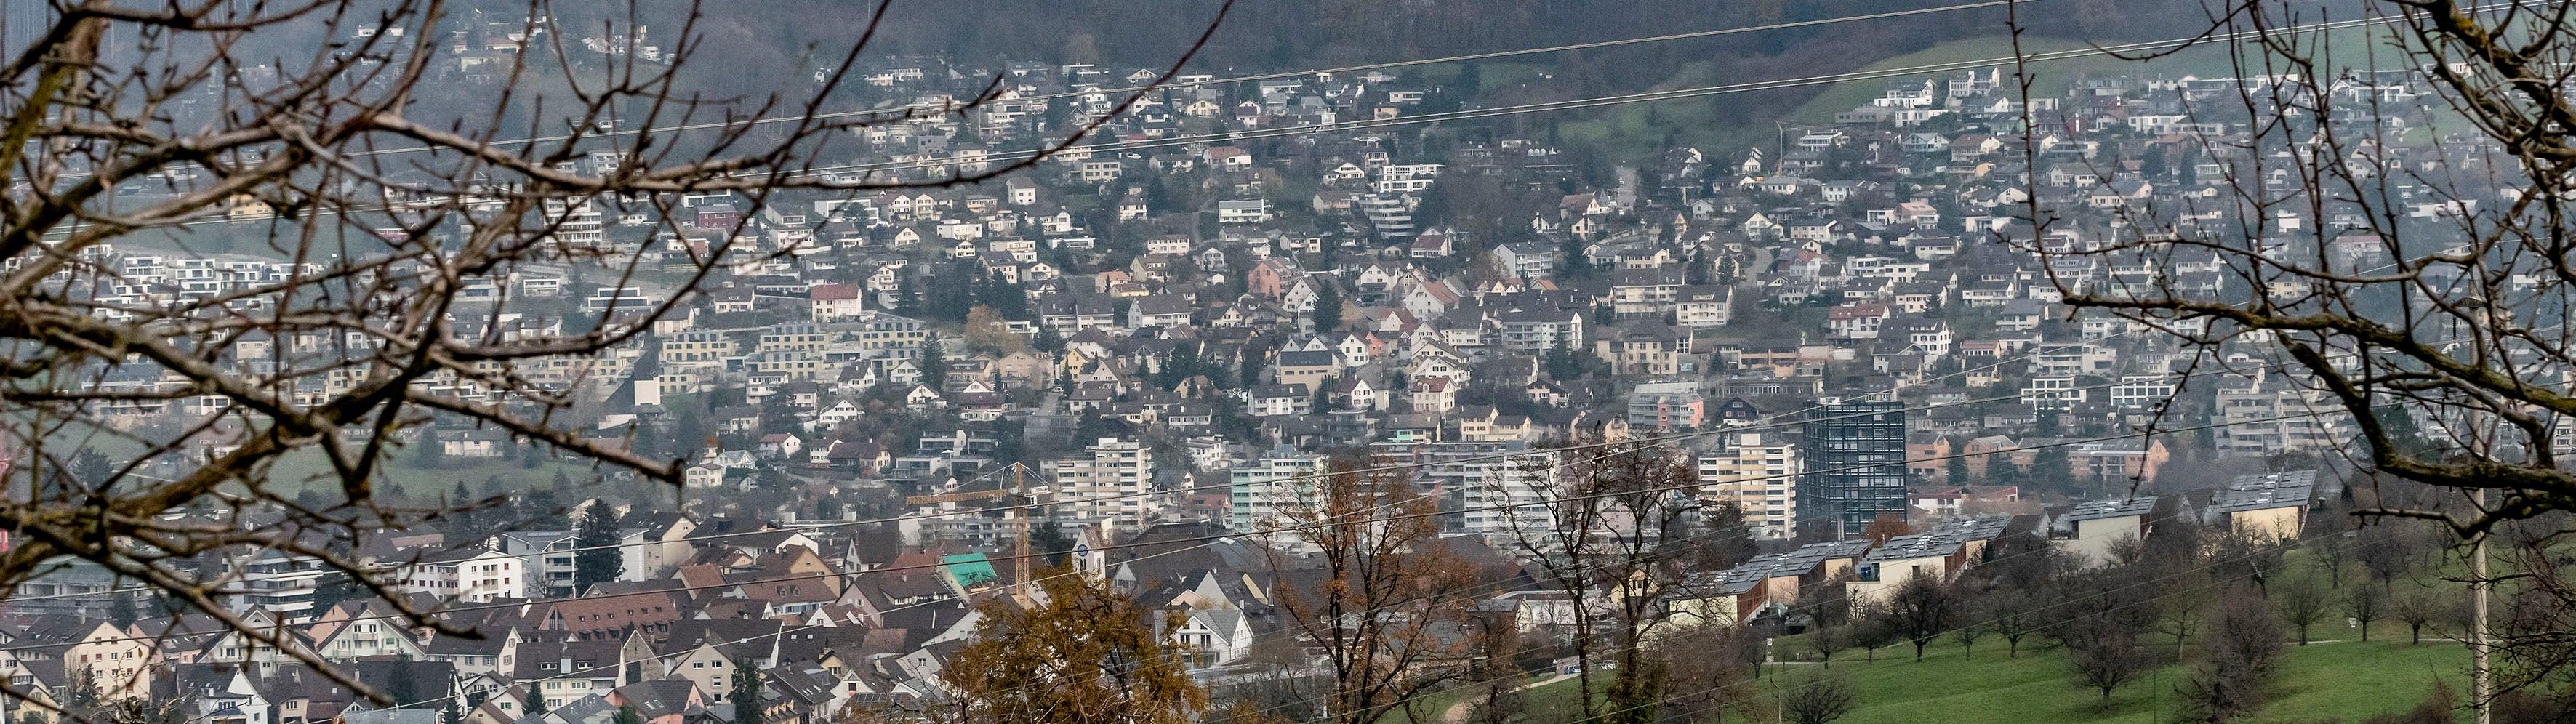 Füllinsdorf